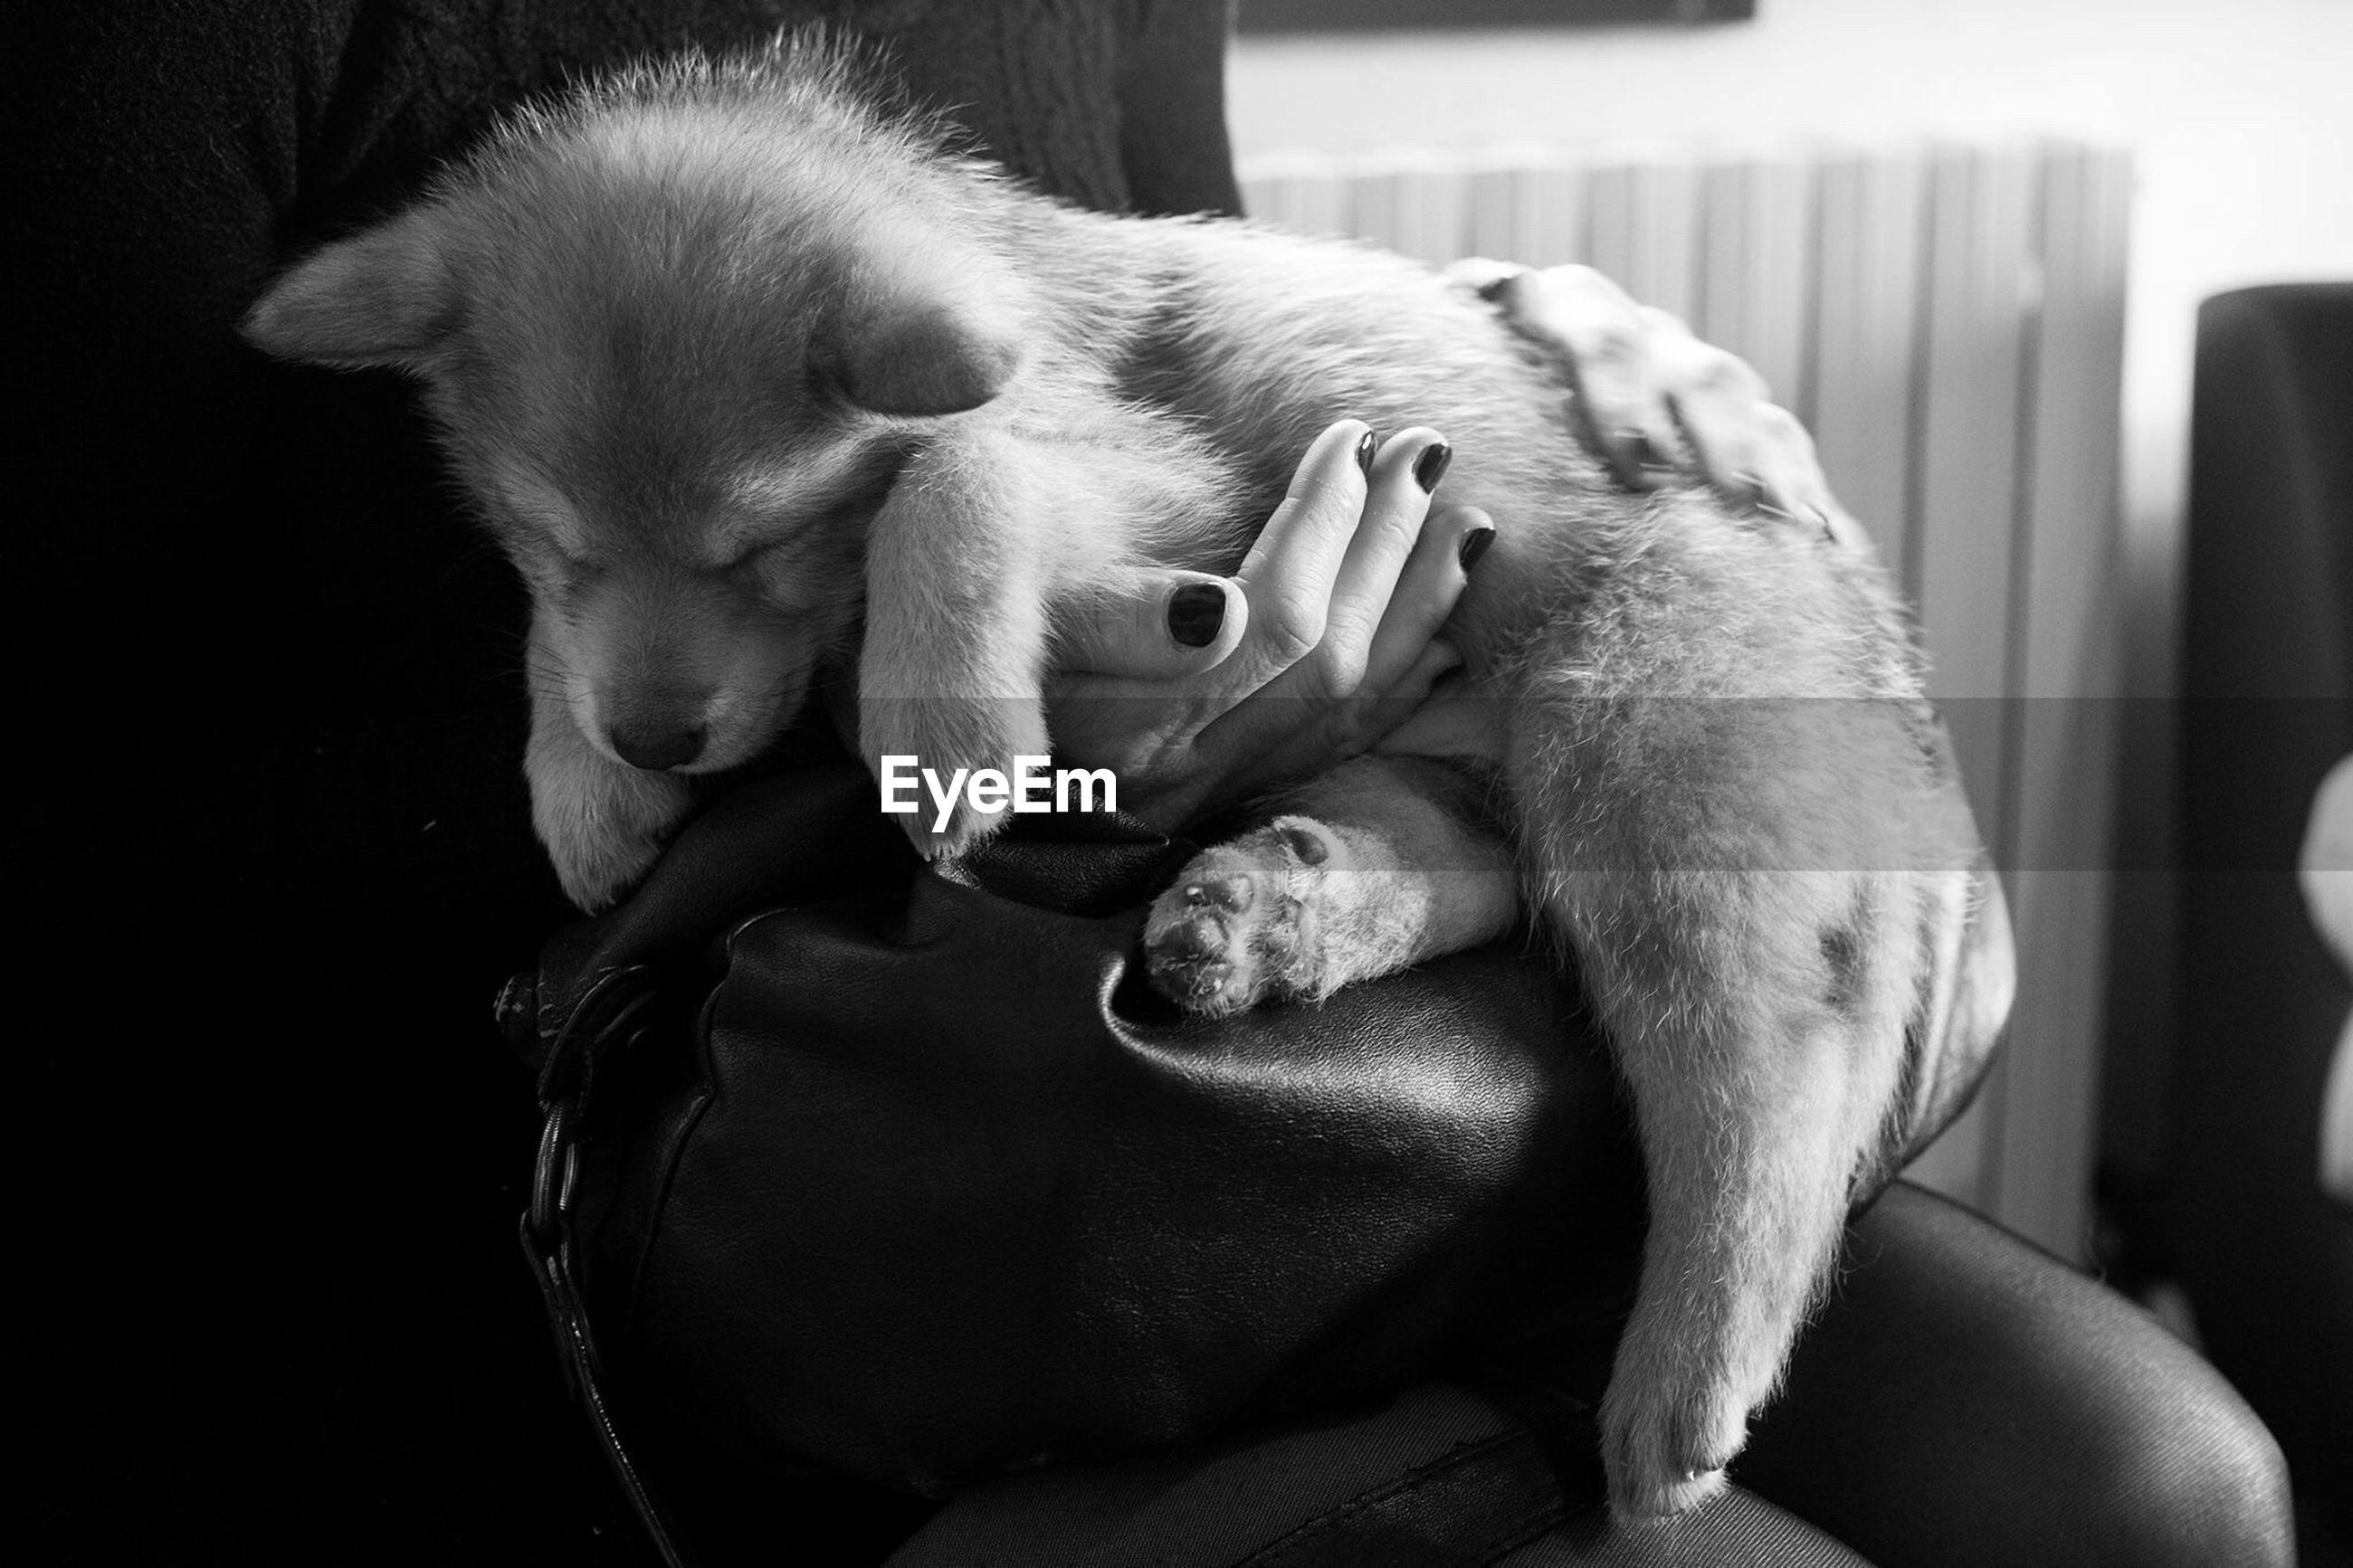 Puppy fall asleep very fast